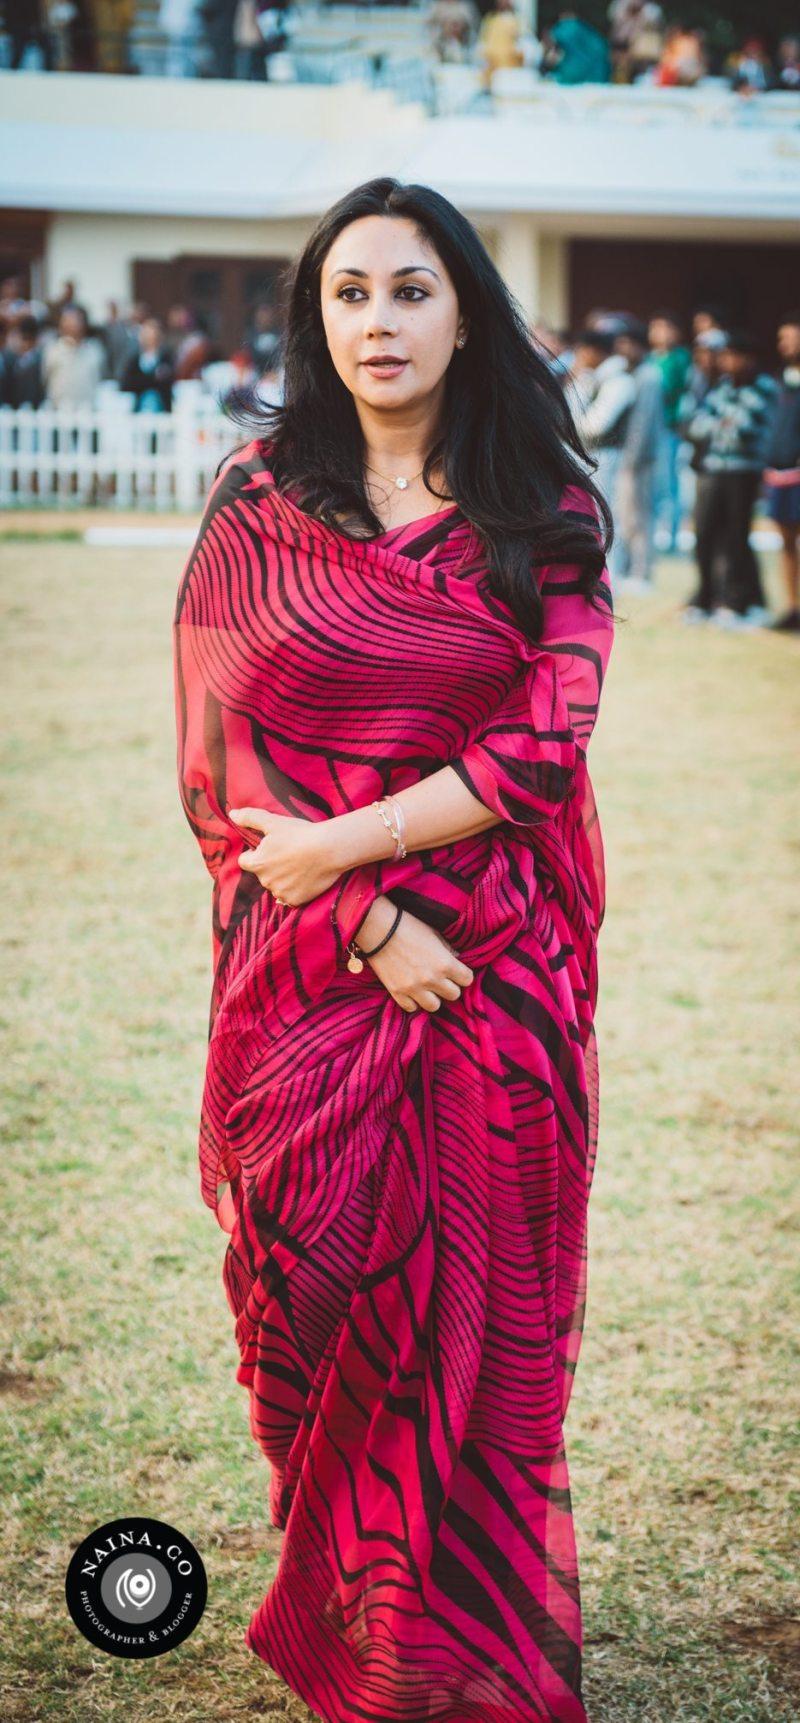 Naina.co-Raconteuse-Visuelle-Photographer-Blogger-Storyteller-Luxury-Lifestyle-January-2015-St.Regis-Polo-Cup-Maharaja-Jaipur-EyesForStreetStyle-17